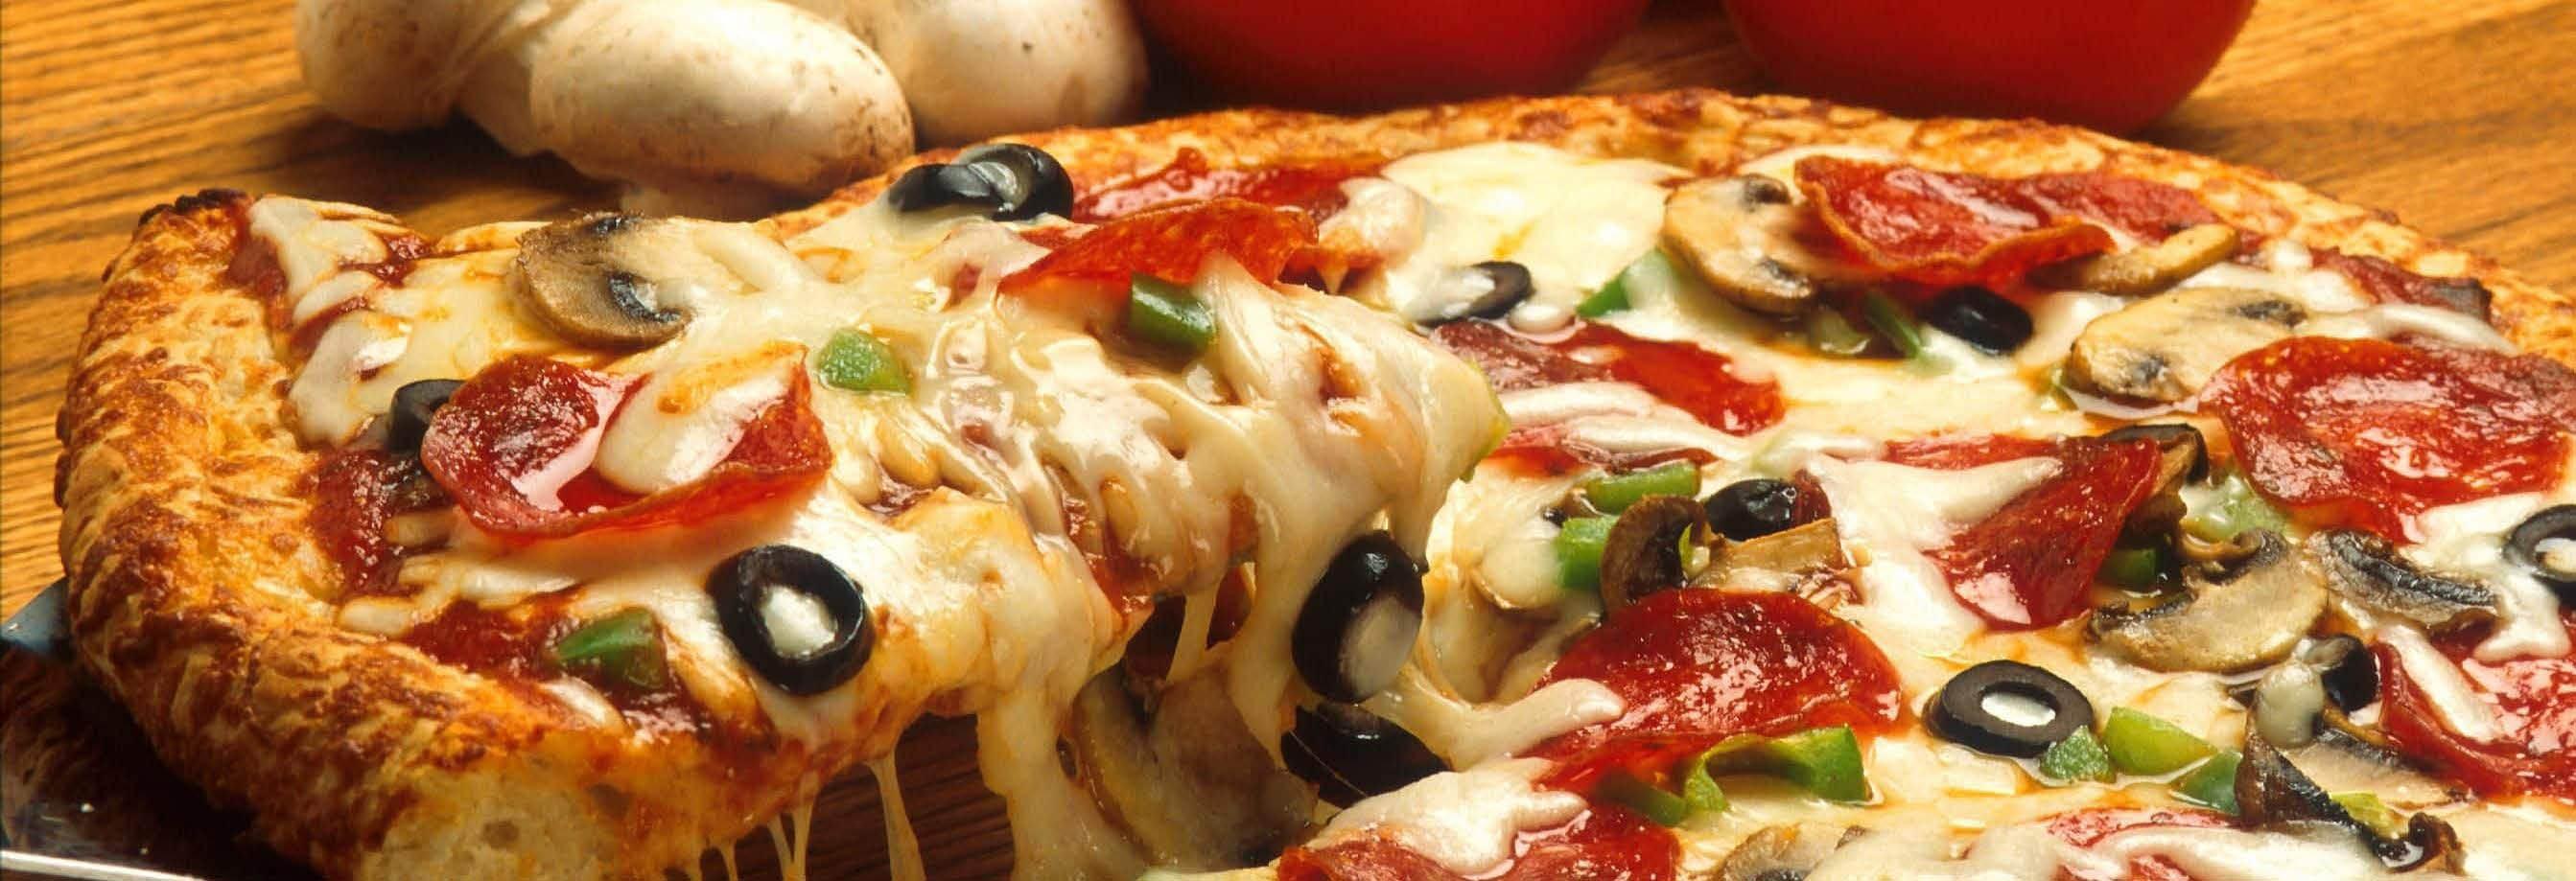 novas pizza,fresh ingredients,pizza,west chester pizza,